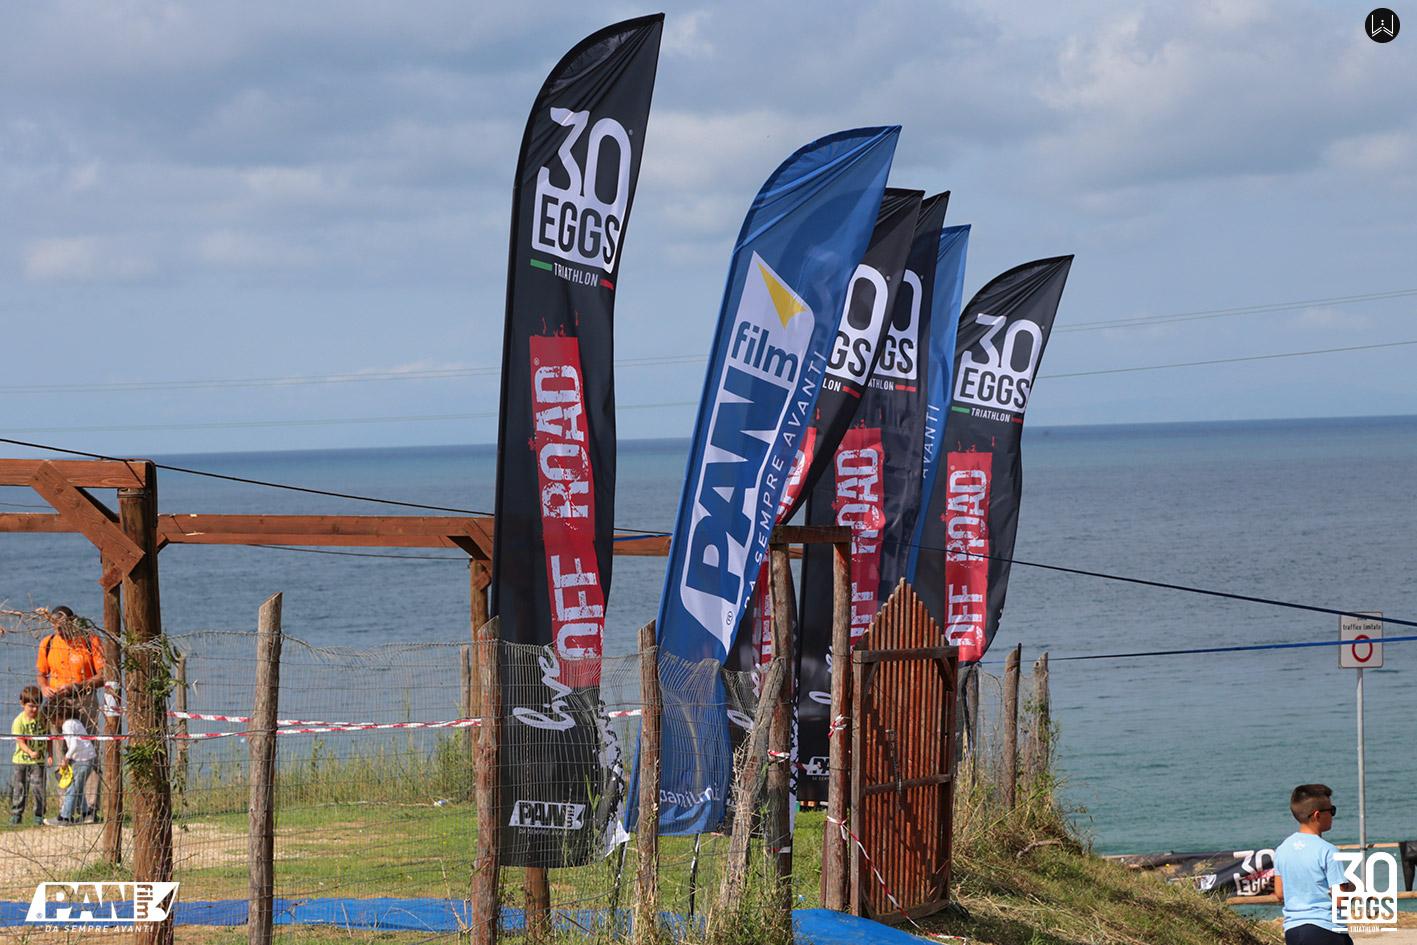 Bandiere - 30EGGS Triathlon Cross Super Sprint